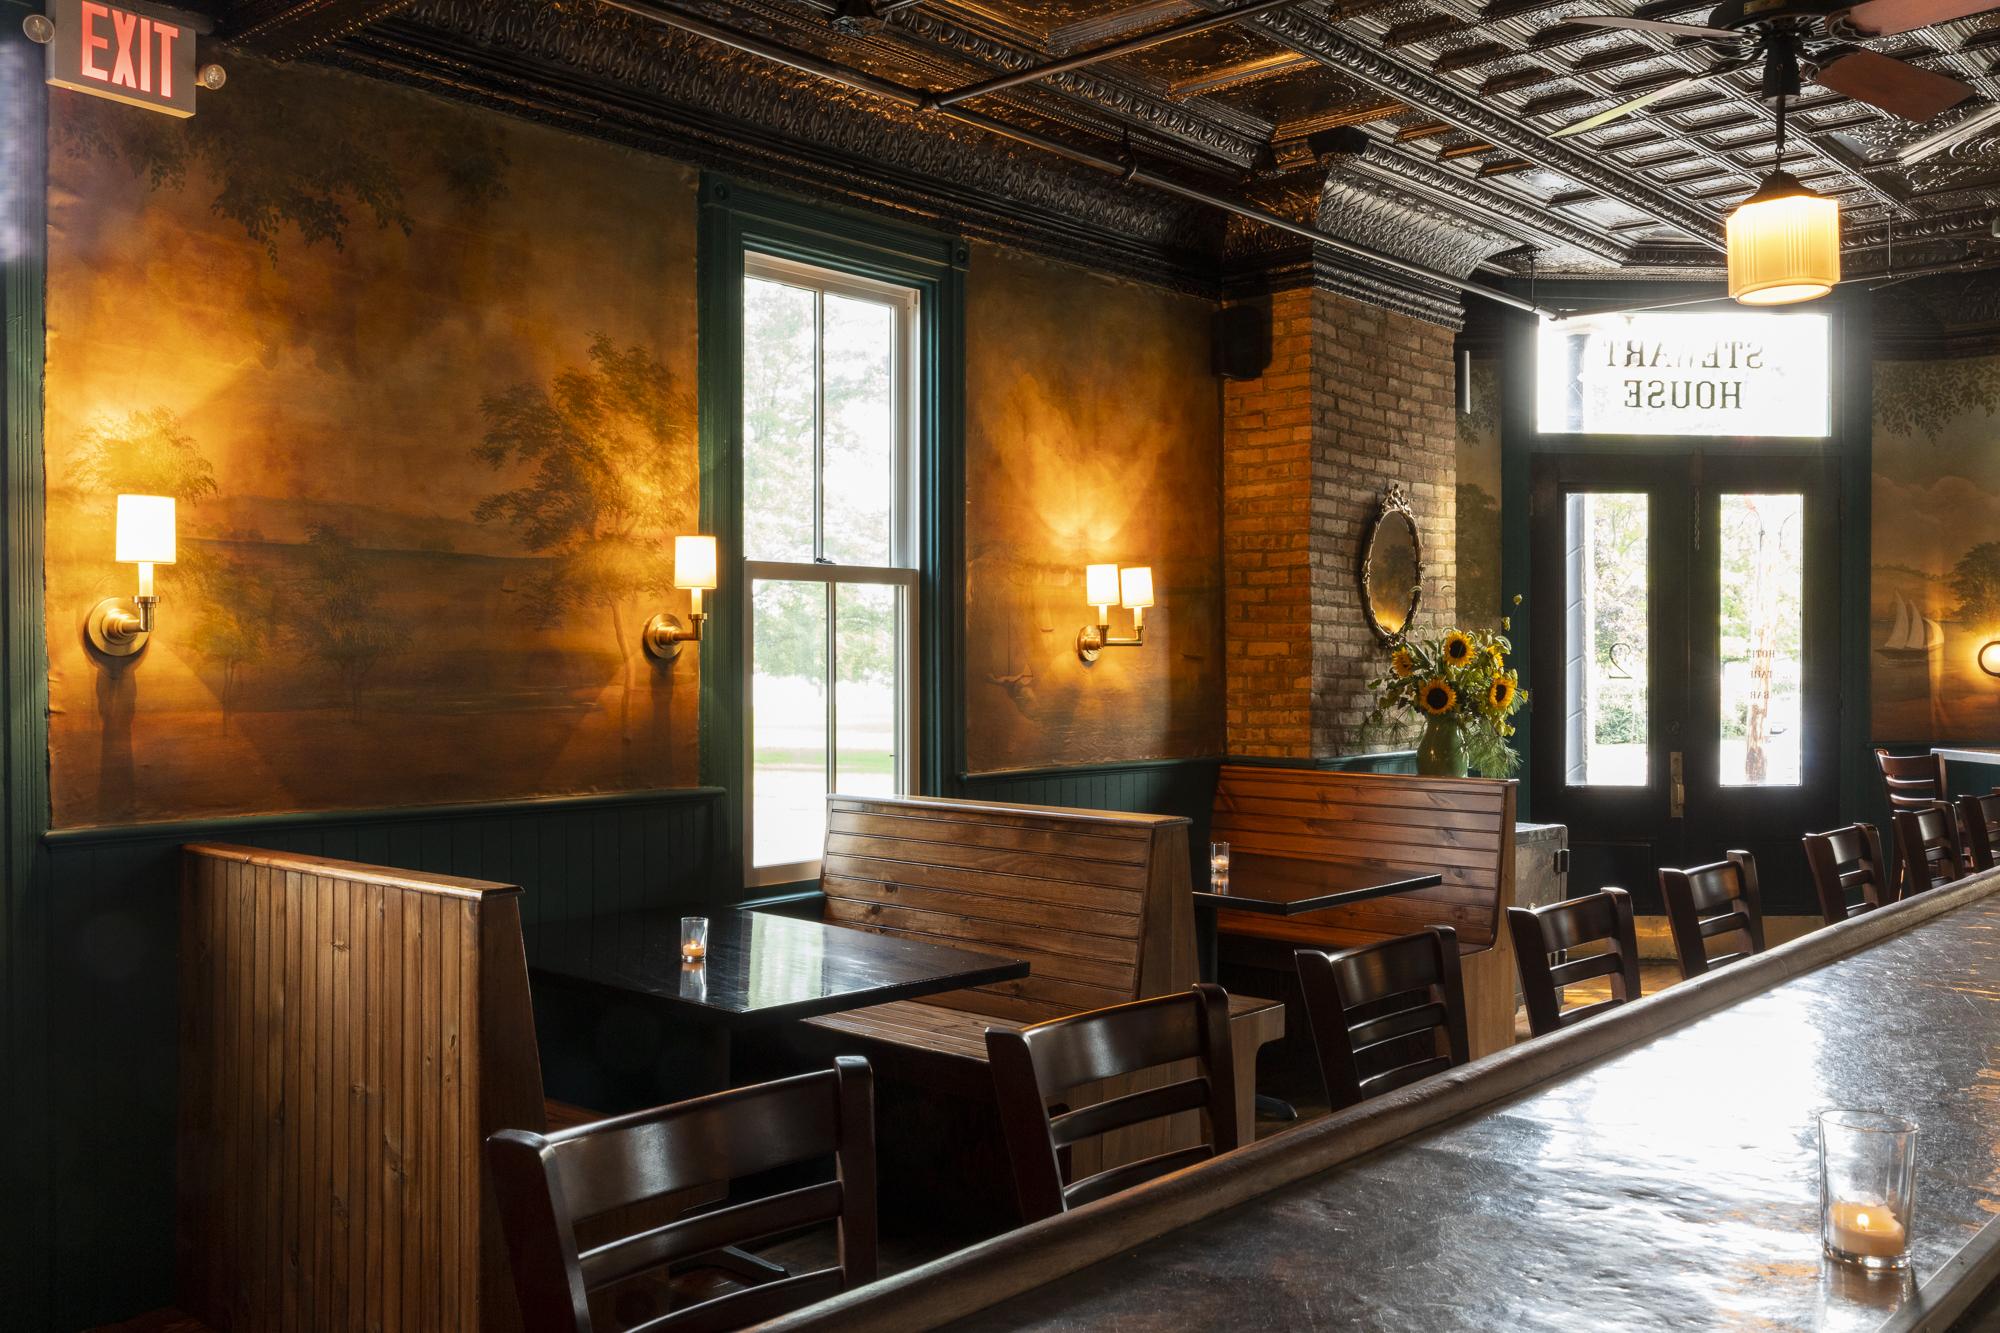 ca.1883 Tavern Craft Cocktail Bar room seating